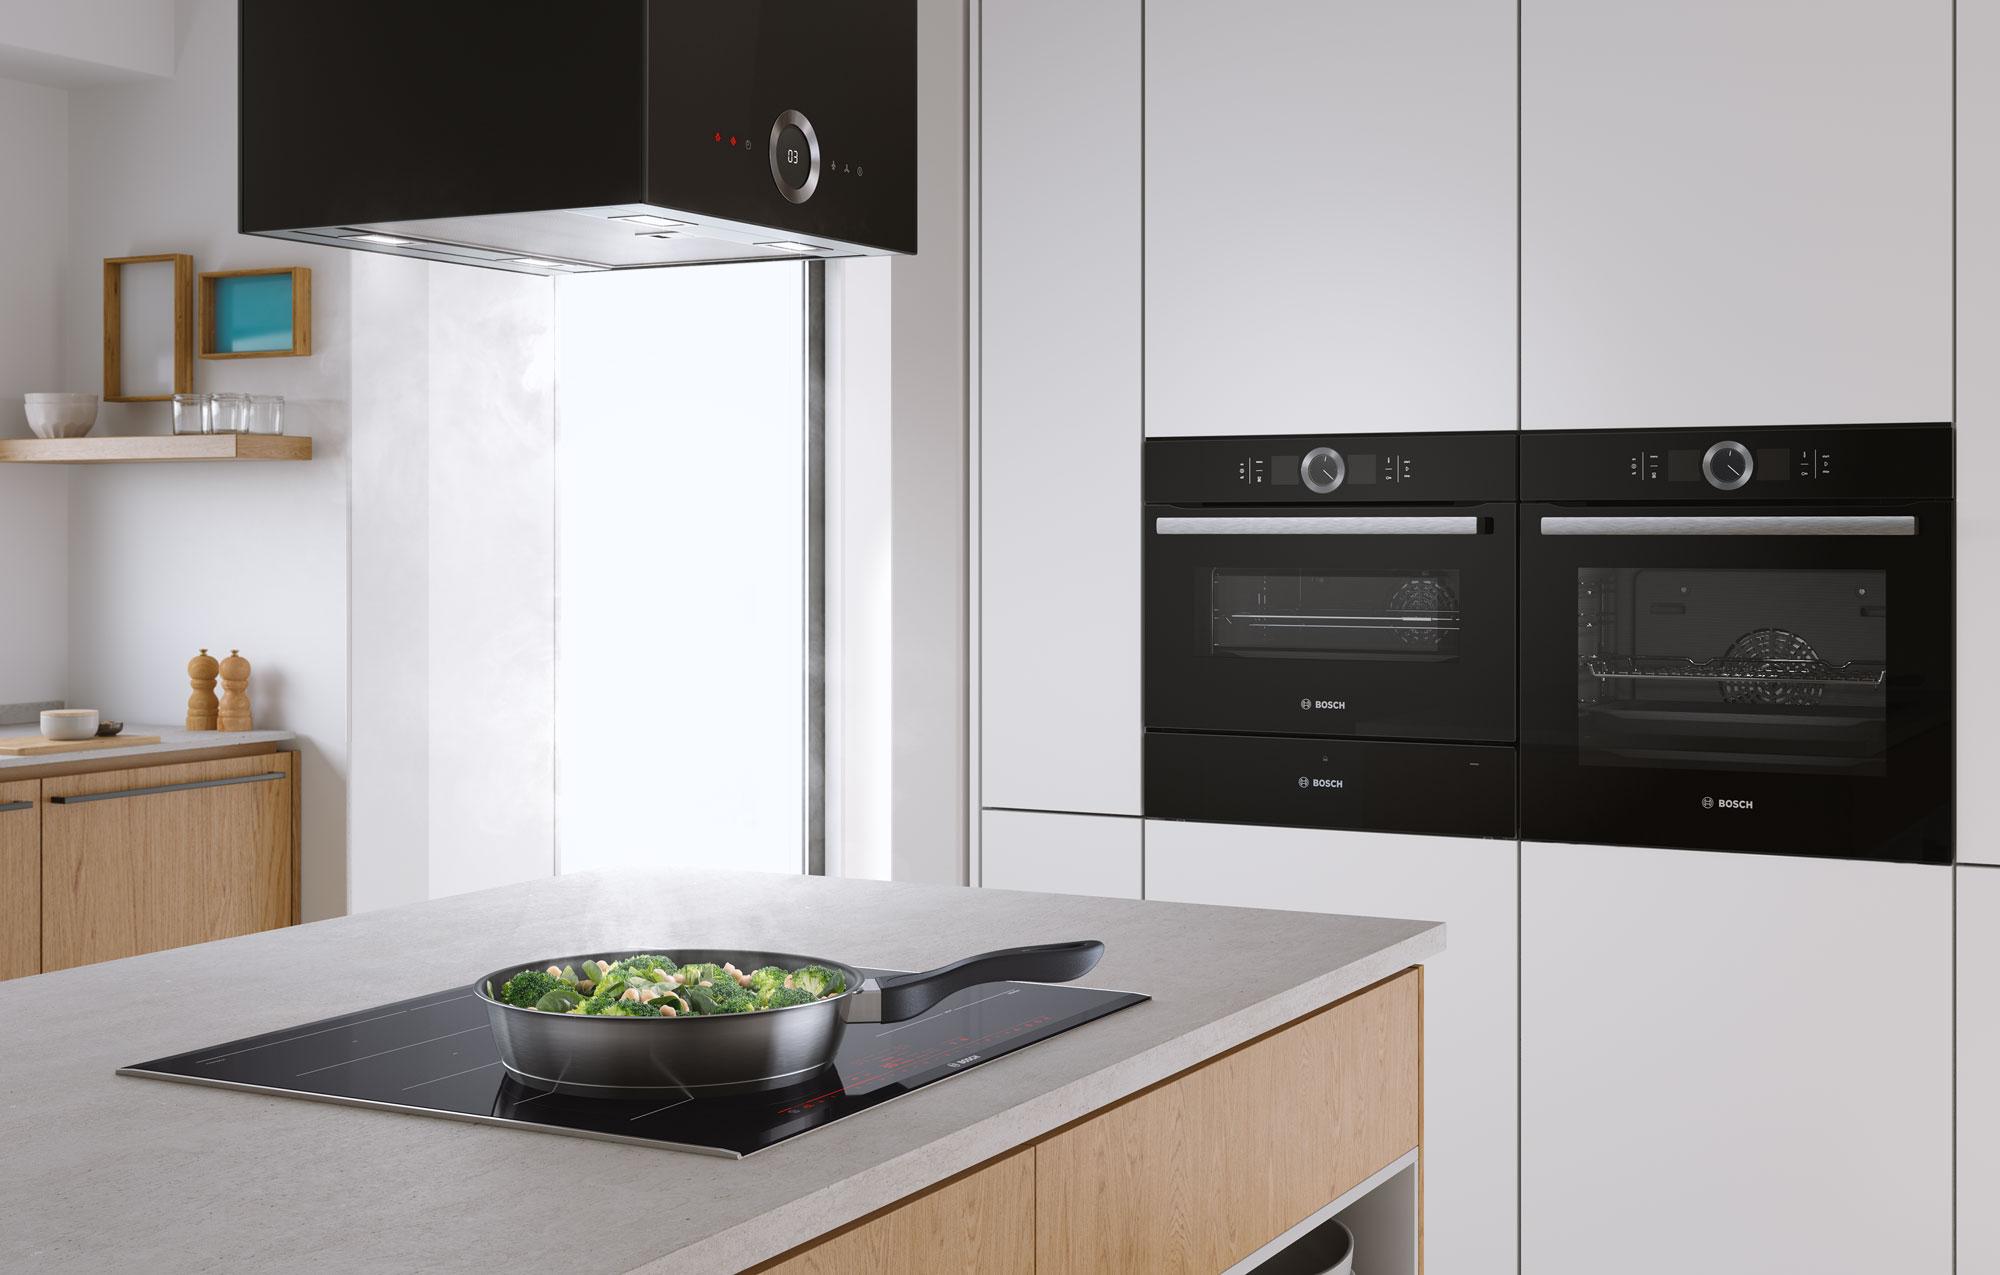 CGI - Bosch - Home Appliances - Induction - Cooker Hood - Oven - Steamer